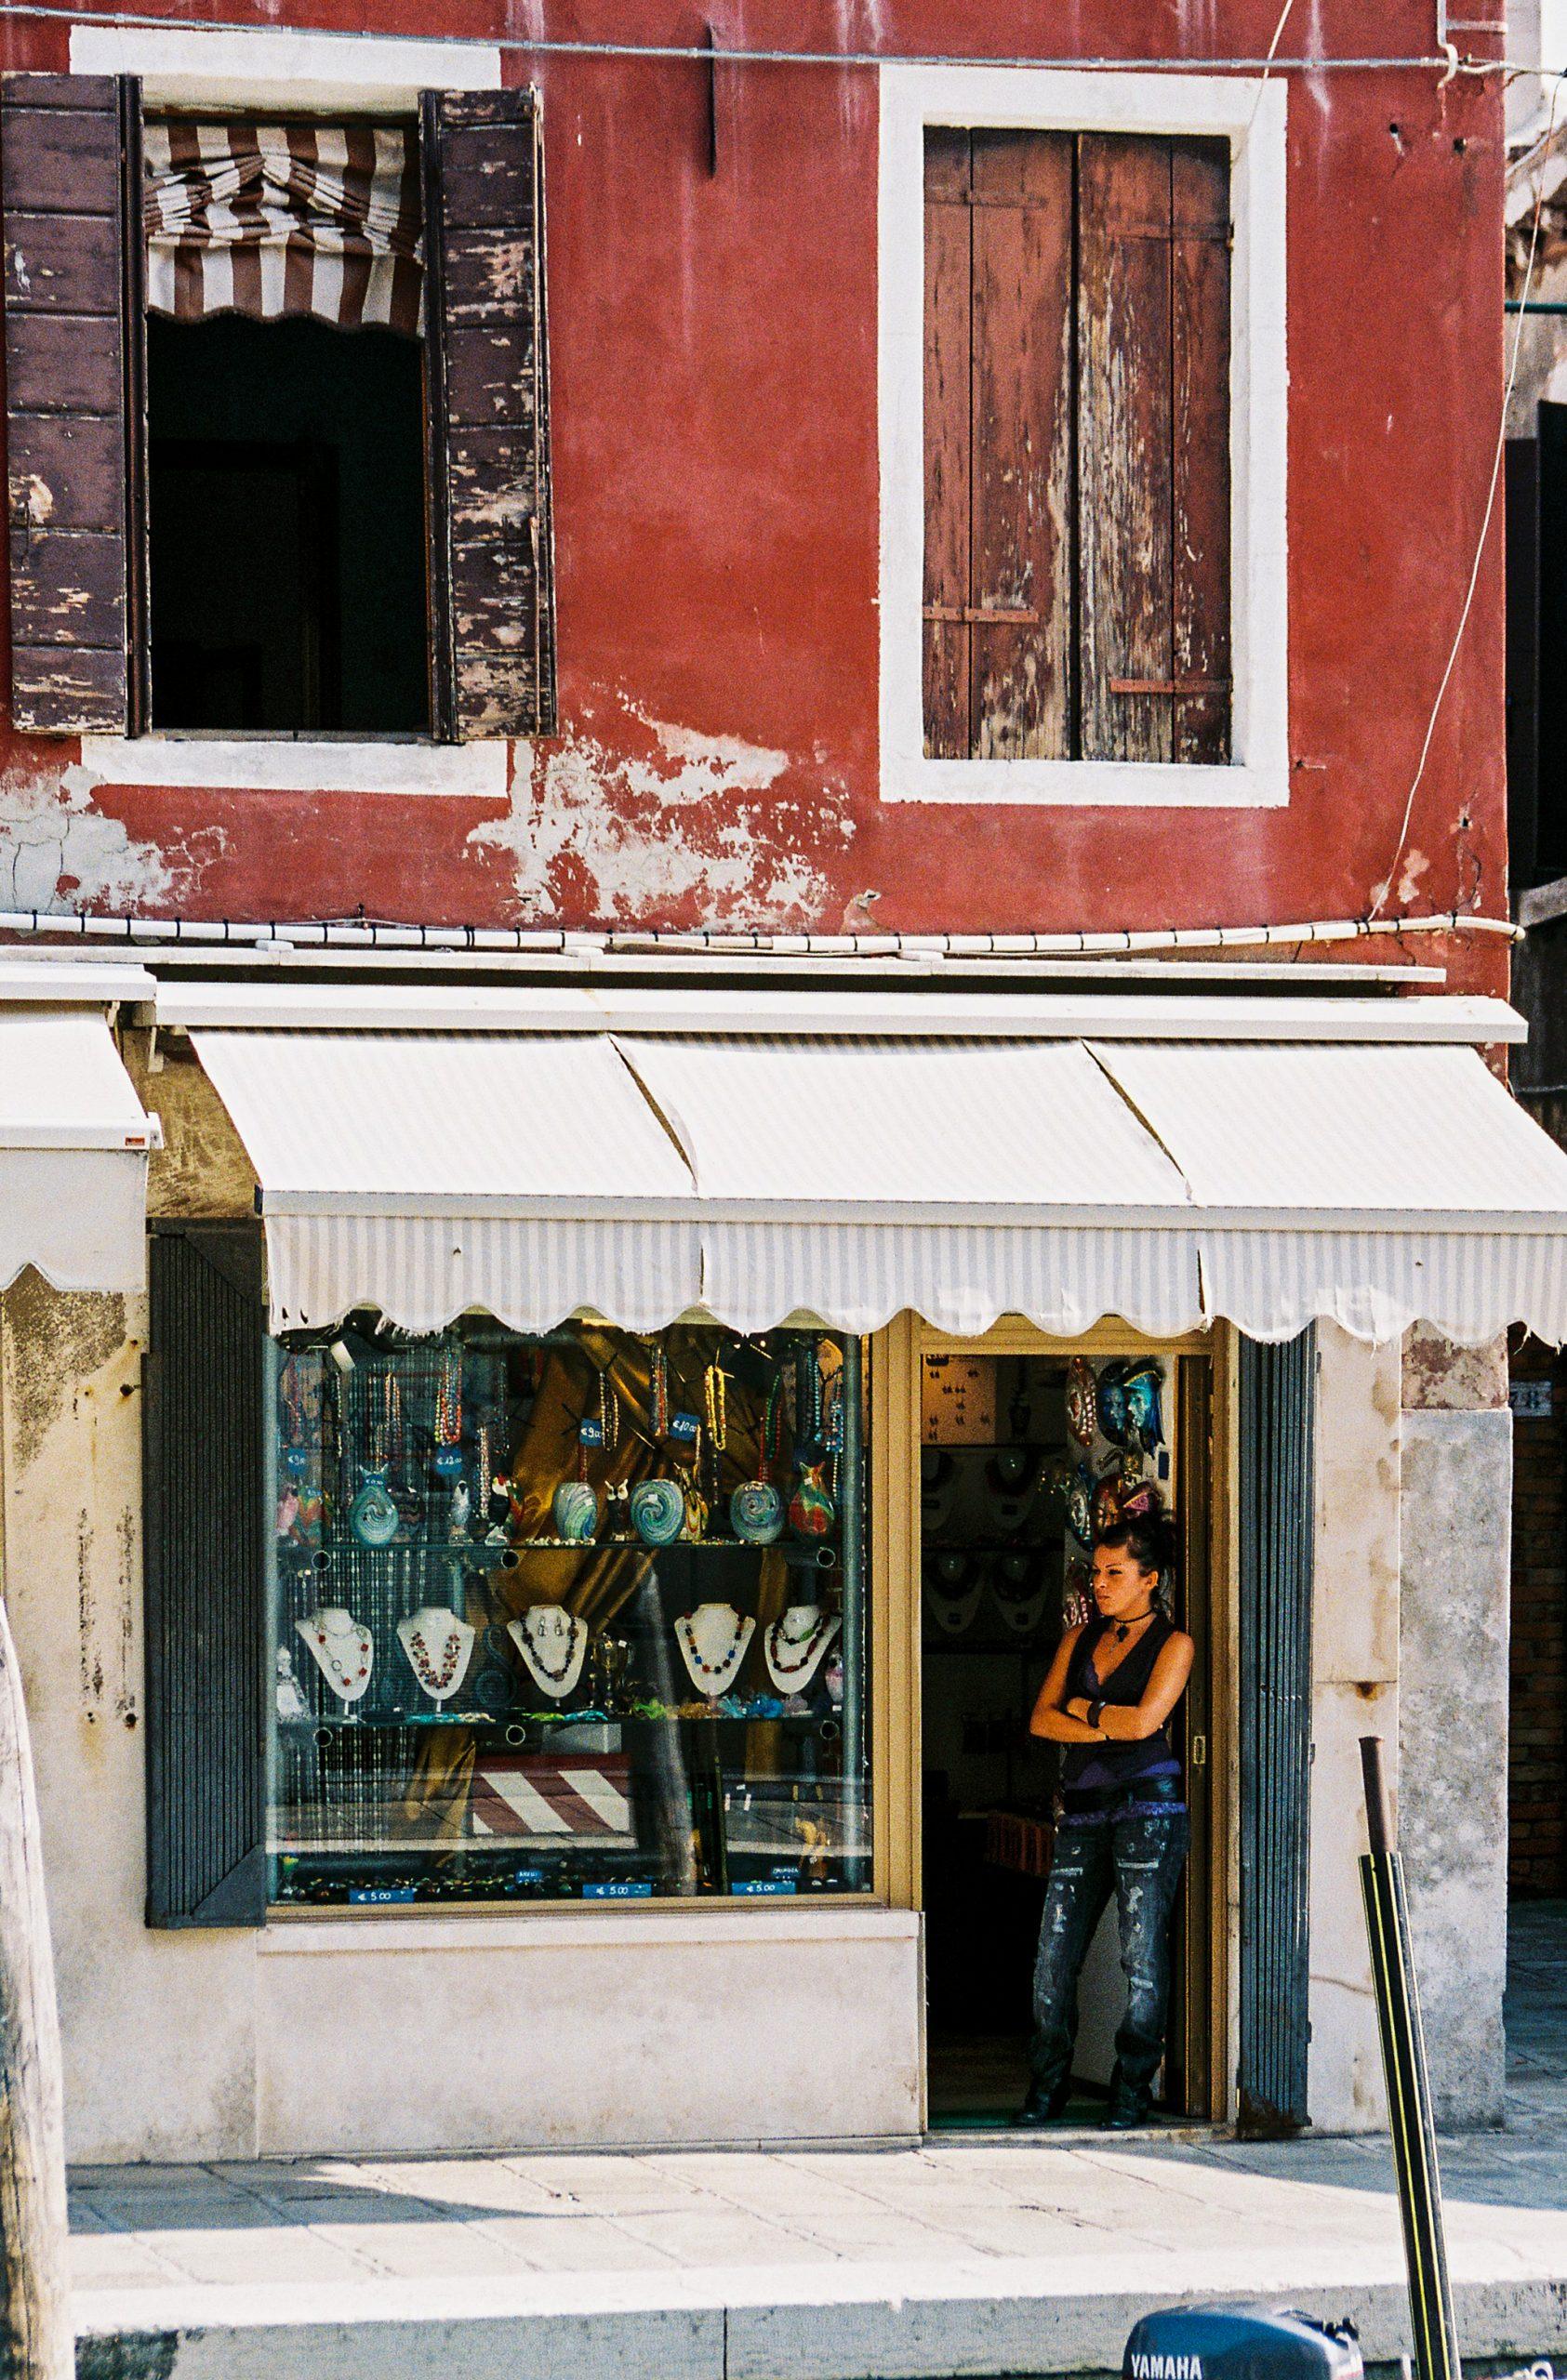 Murano, Venice, Italy, Europe